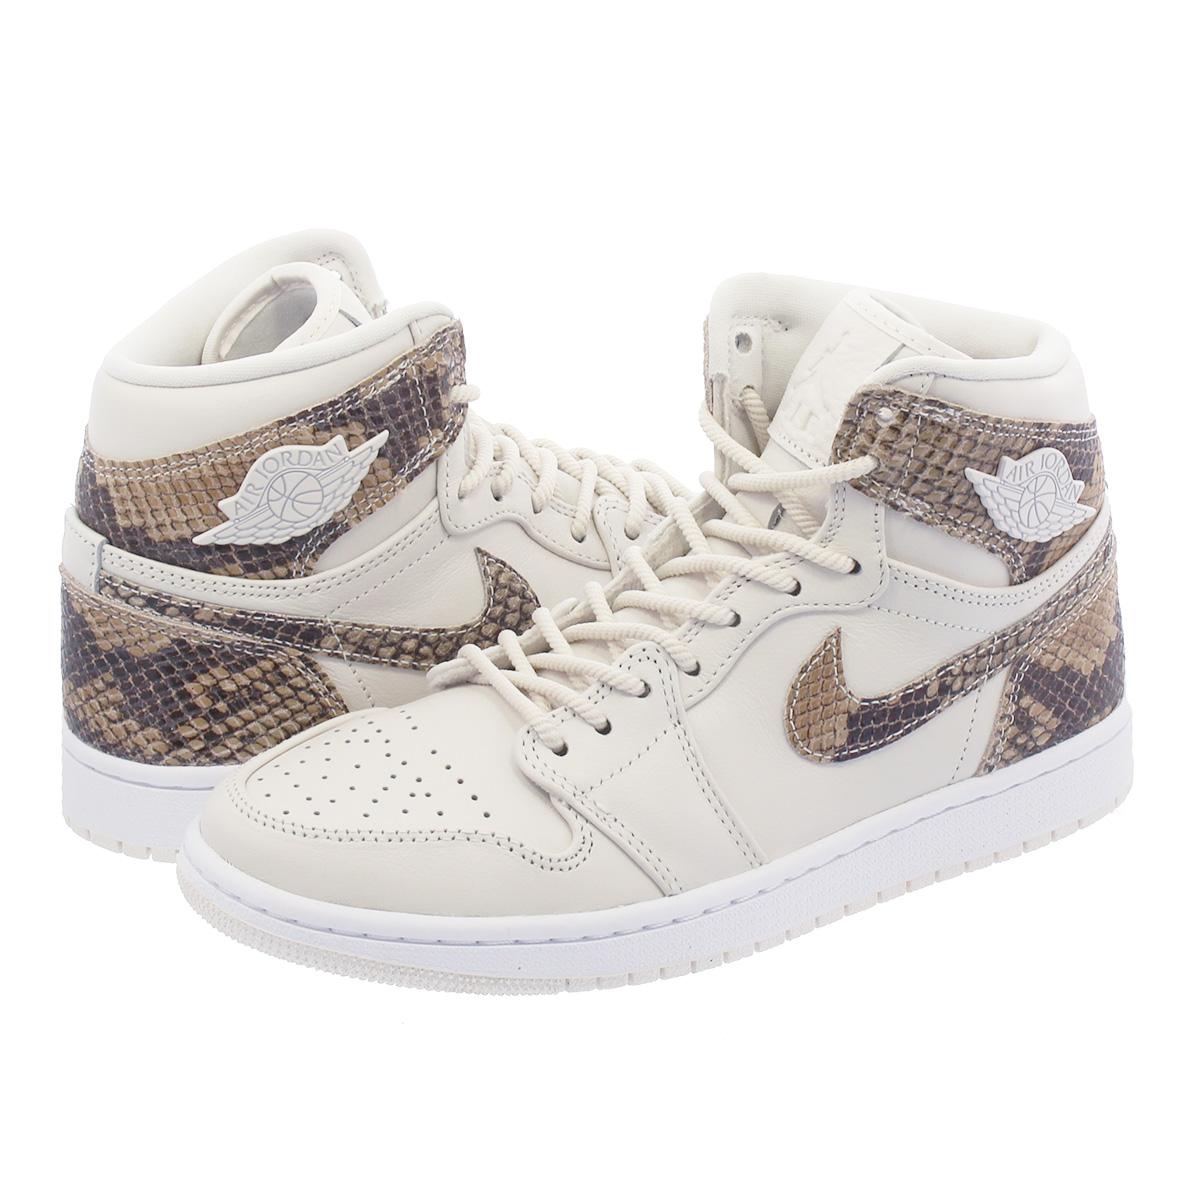 release date: later unique design NIKE WMNS AIR JORDAN 1 RETRO HI PREM Nike women Air Jordan 1 nostalgic high  premium PHANTOM/WHITE ah7389-004